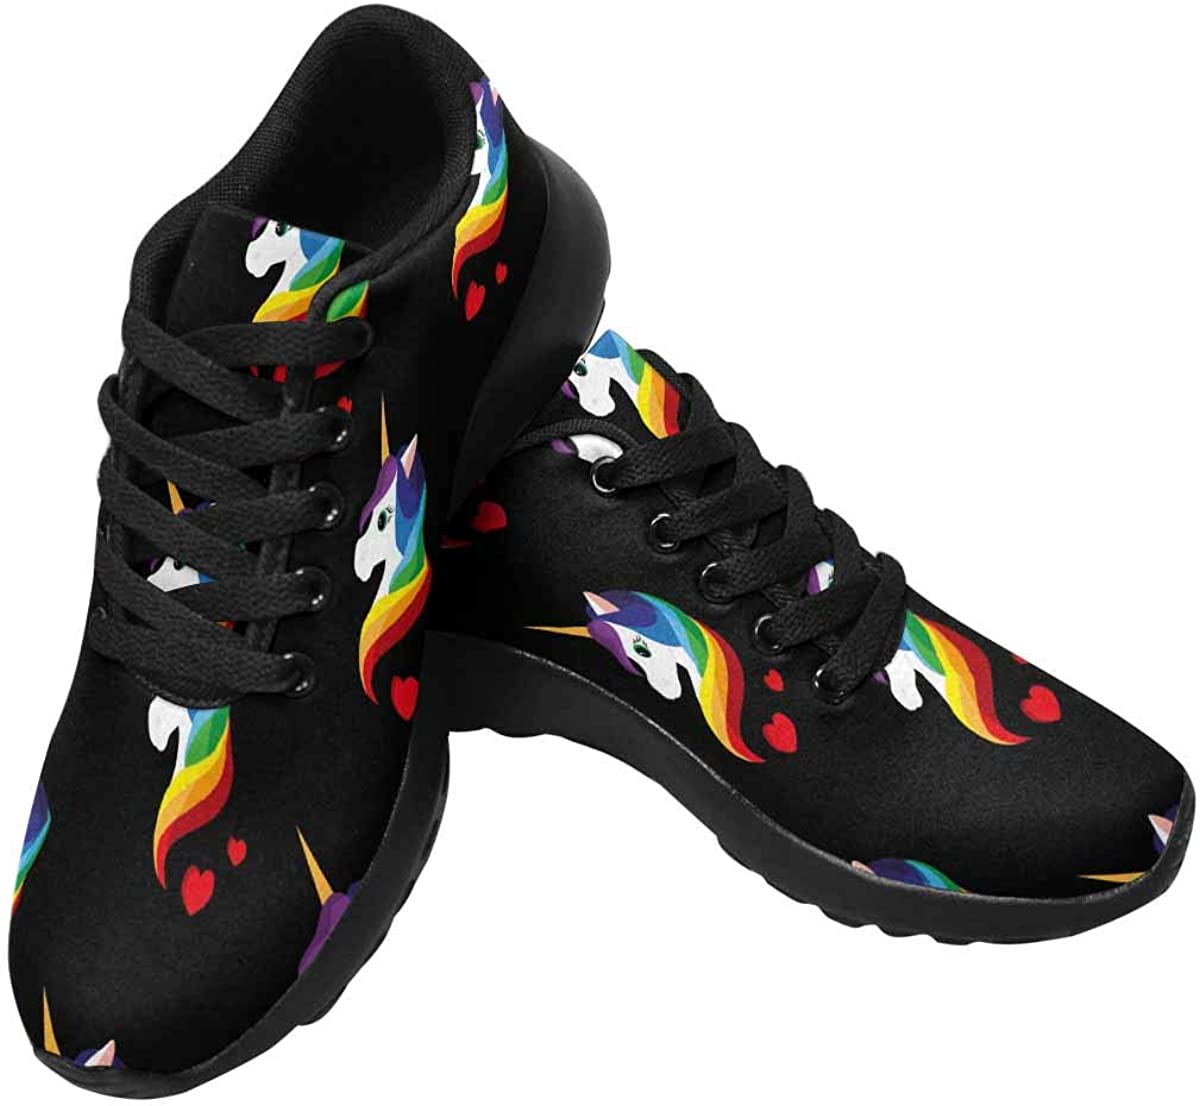 InterestPrint Women's Bombing Regular store new work Sports Running Shoes Road